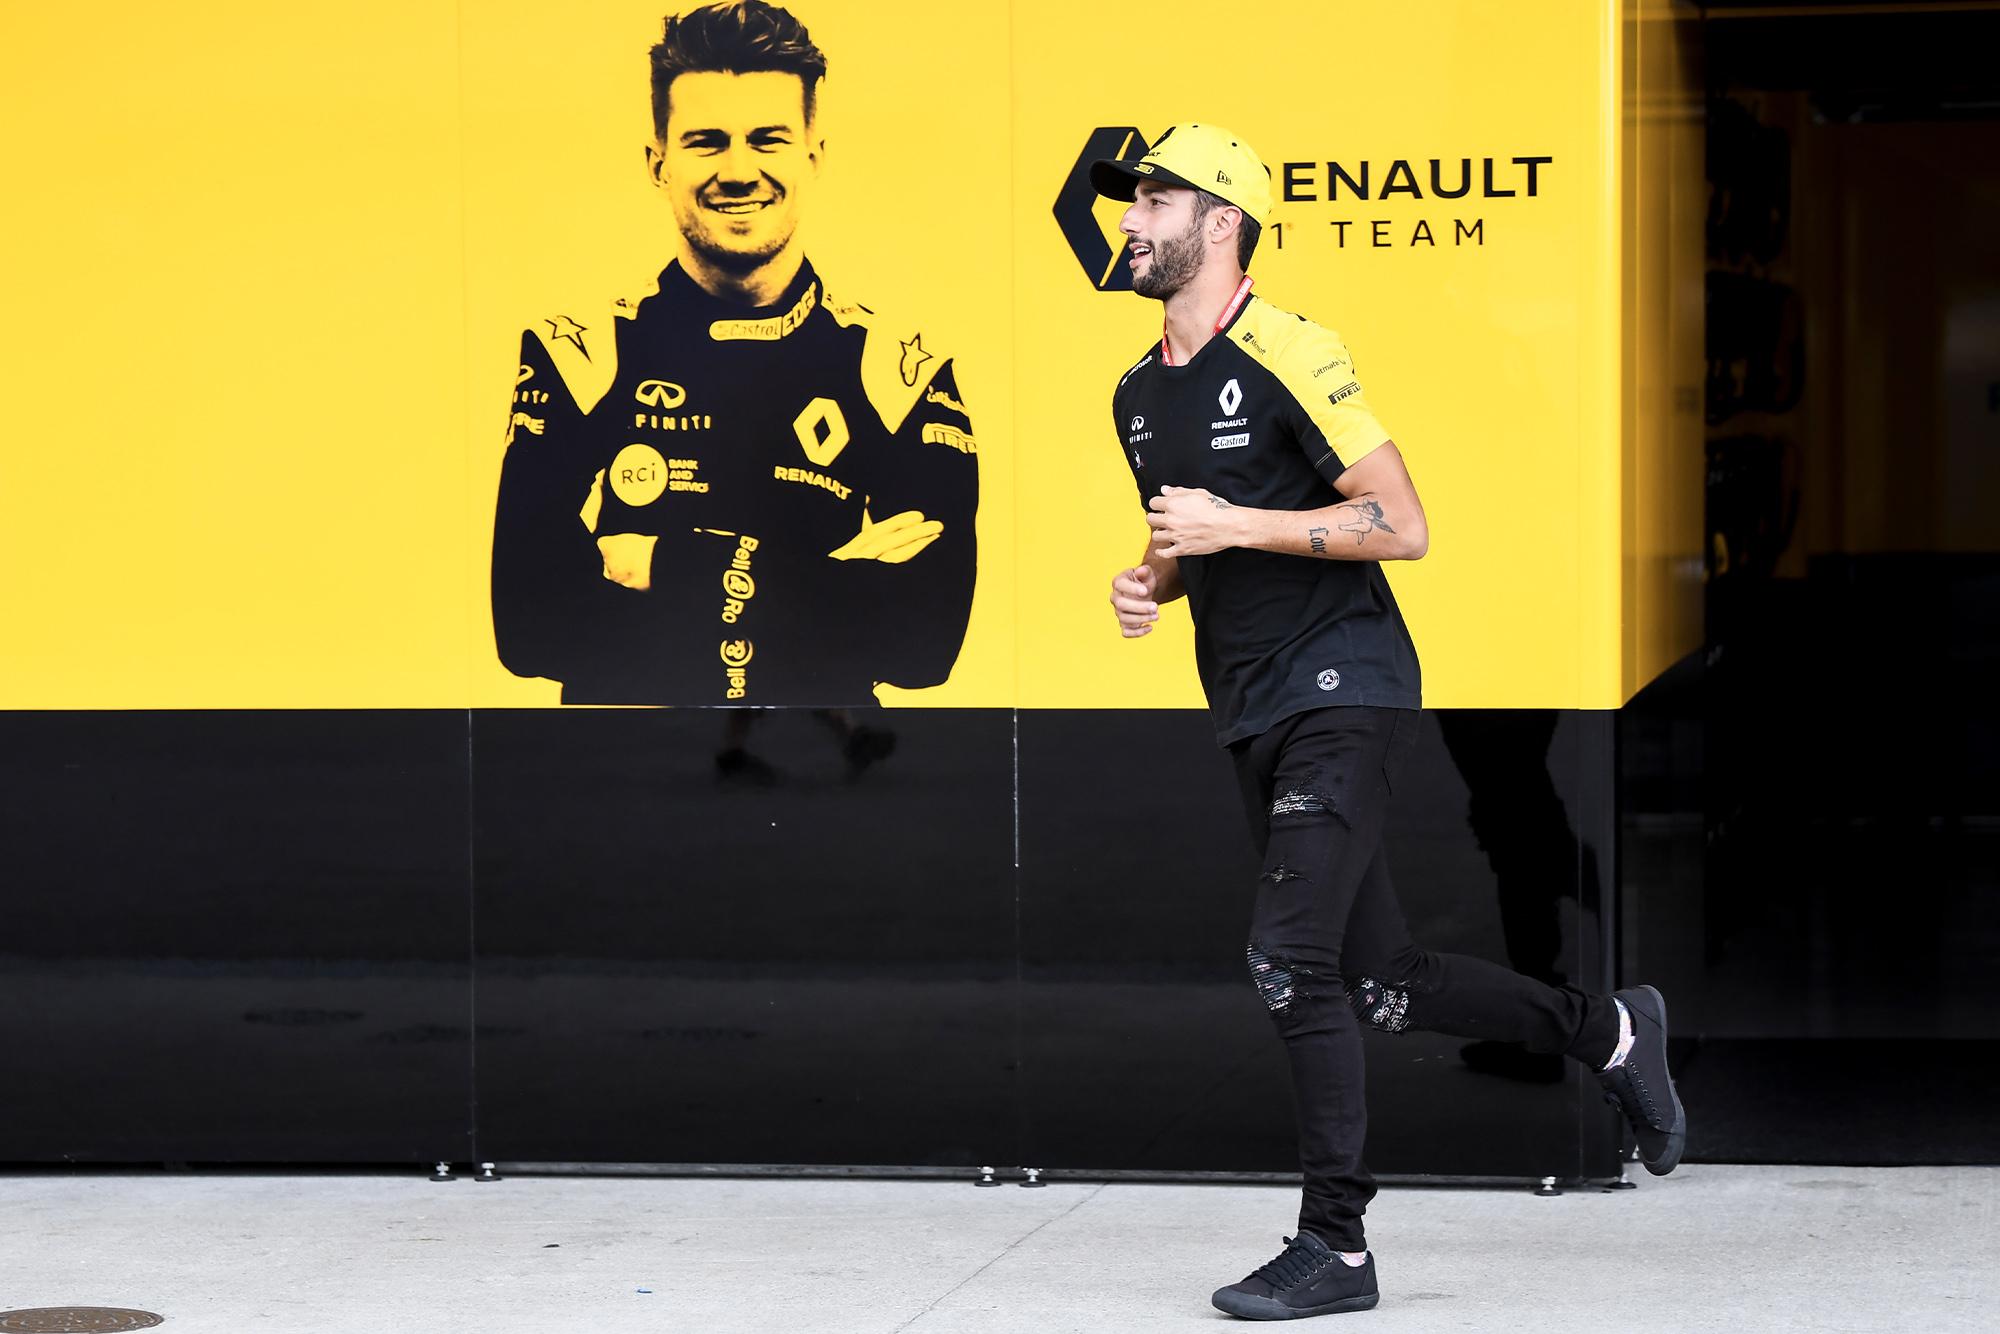 Daniel Ricciardo runs past a board showing his Renault team-mate Nico Hulkenberg